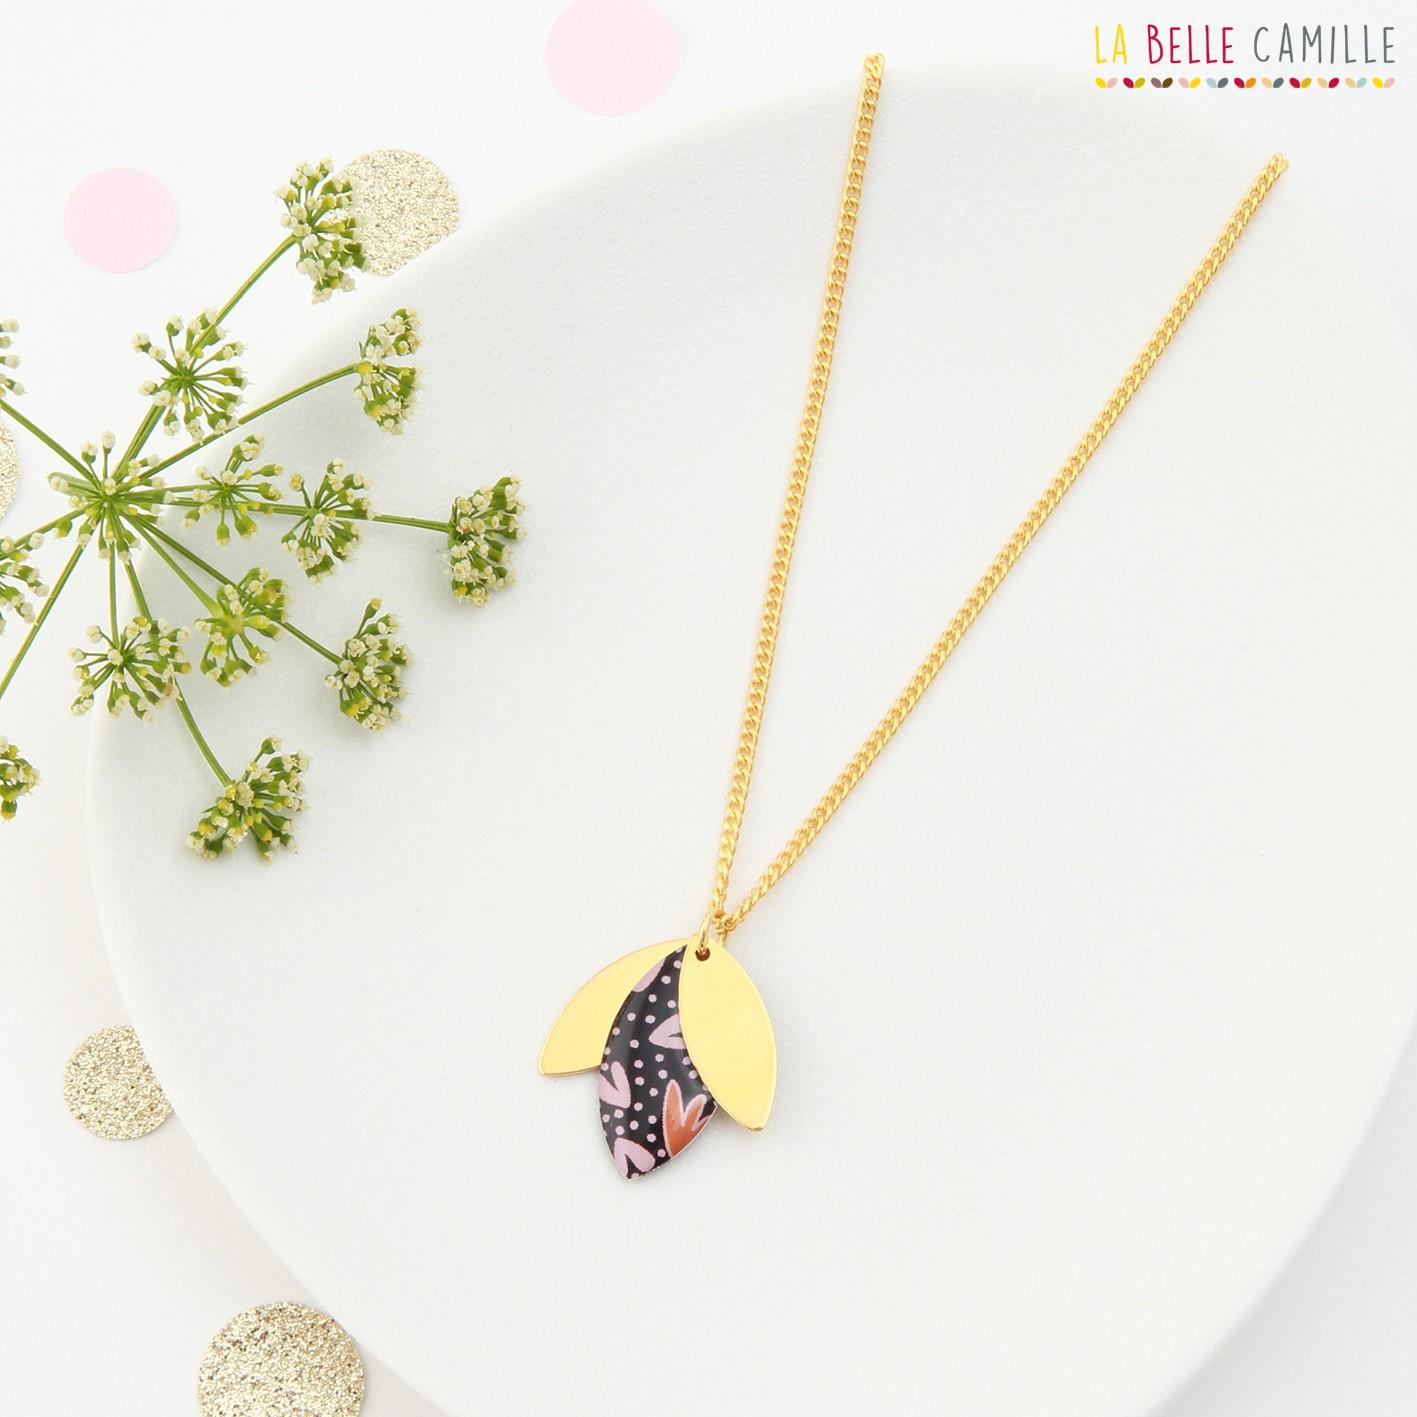 Necklace chainette golden woman and retsina La Belle Camille Suzanne Collier